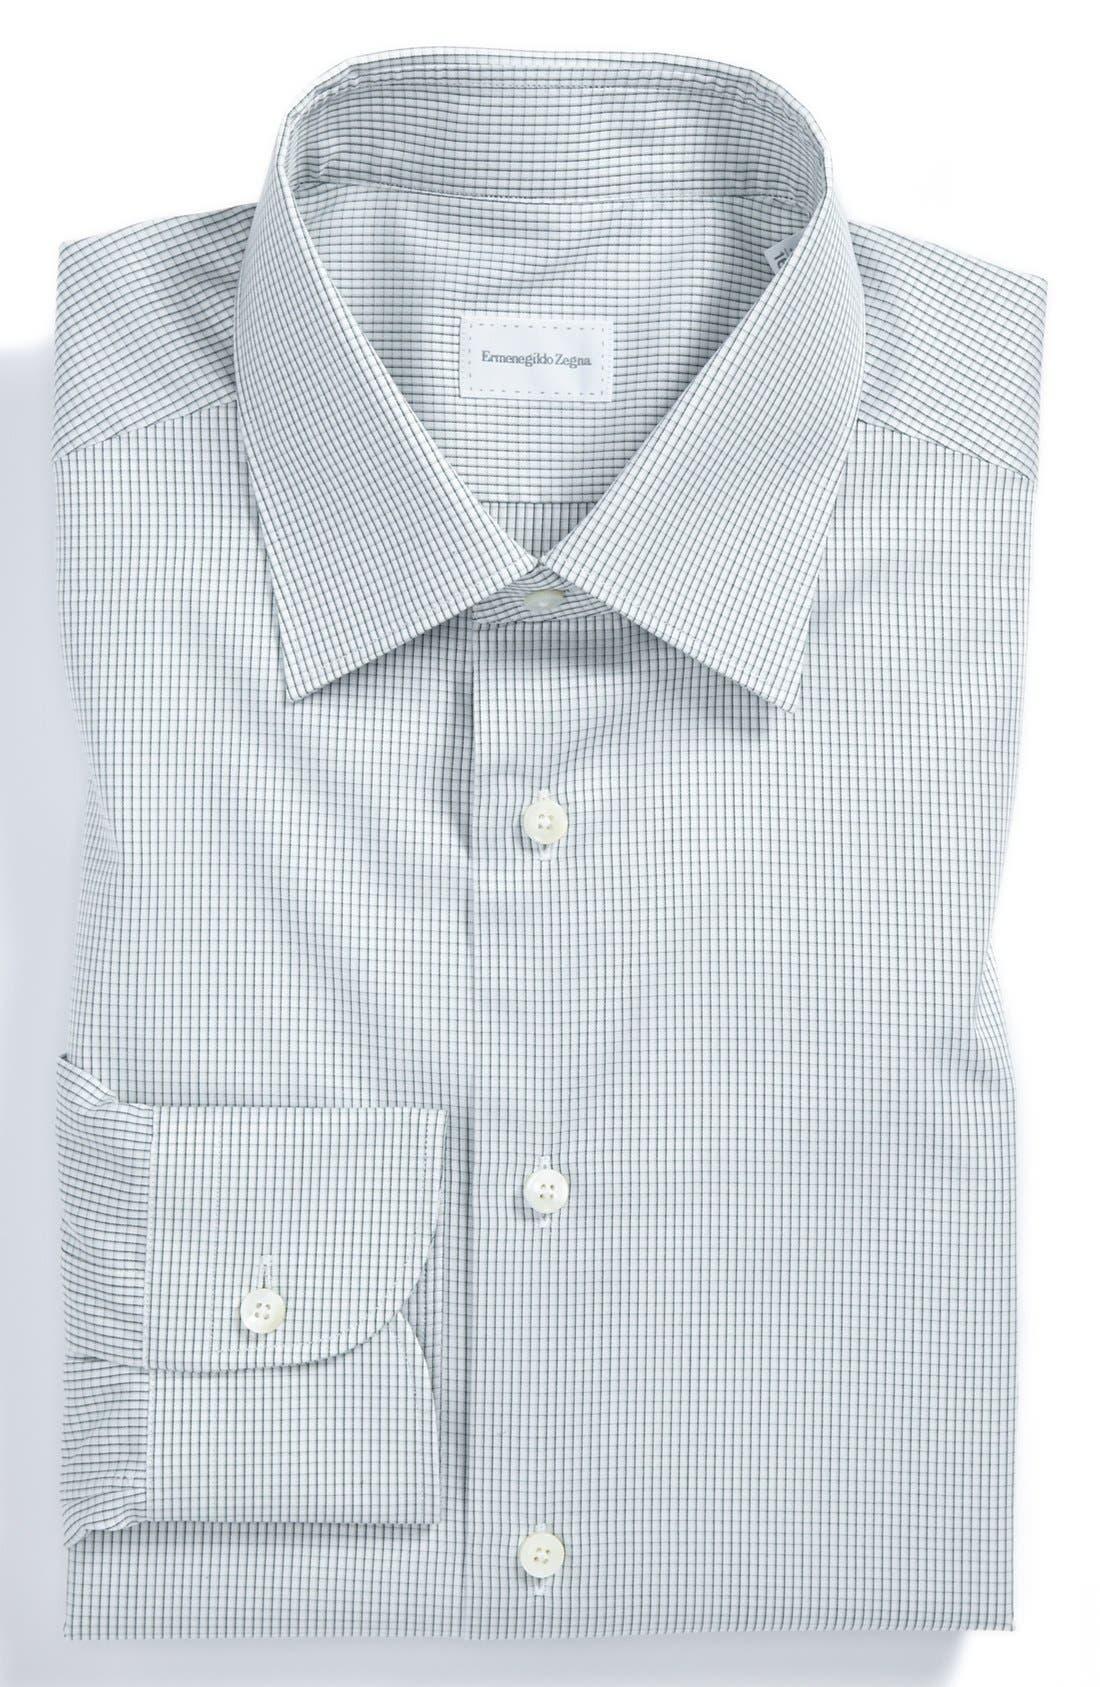 Regular Fit Dress Shirt,                             Main thumbnail 1, color,                             306